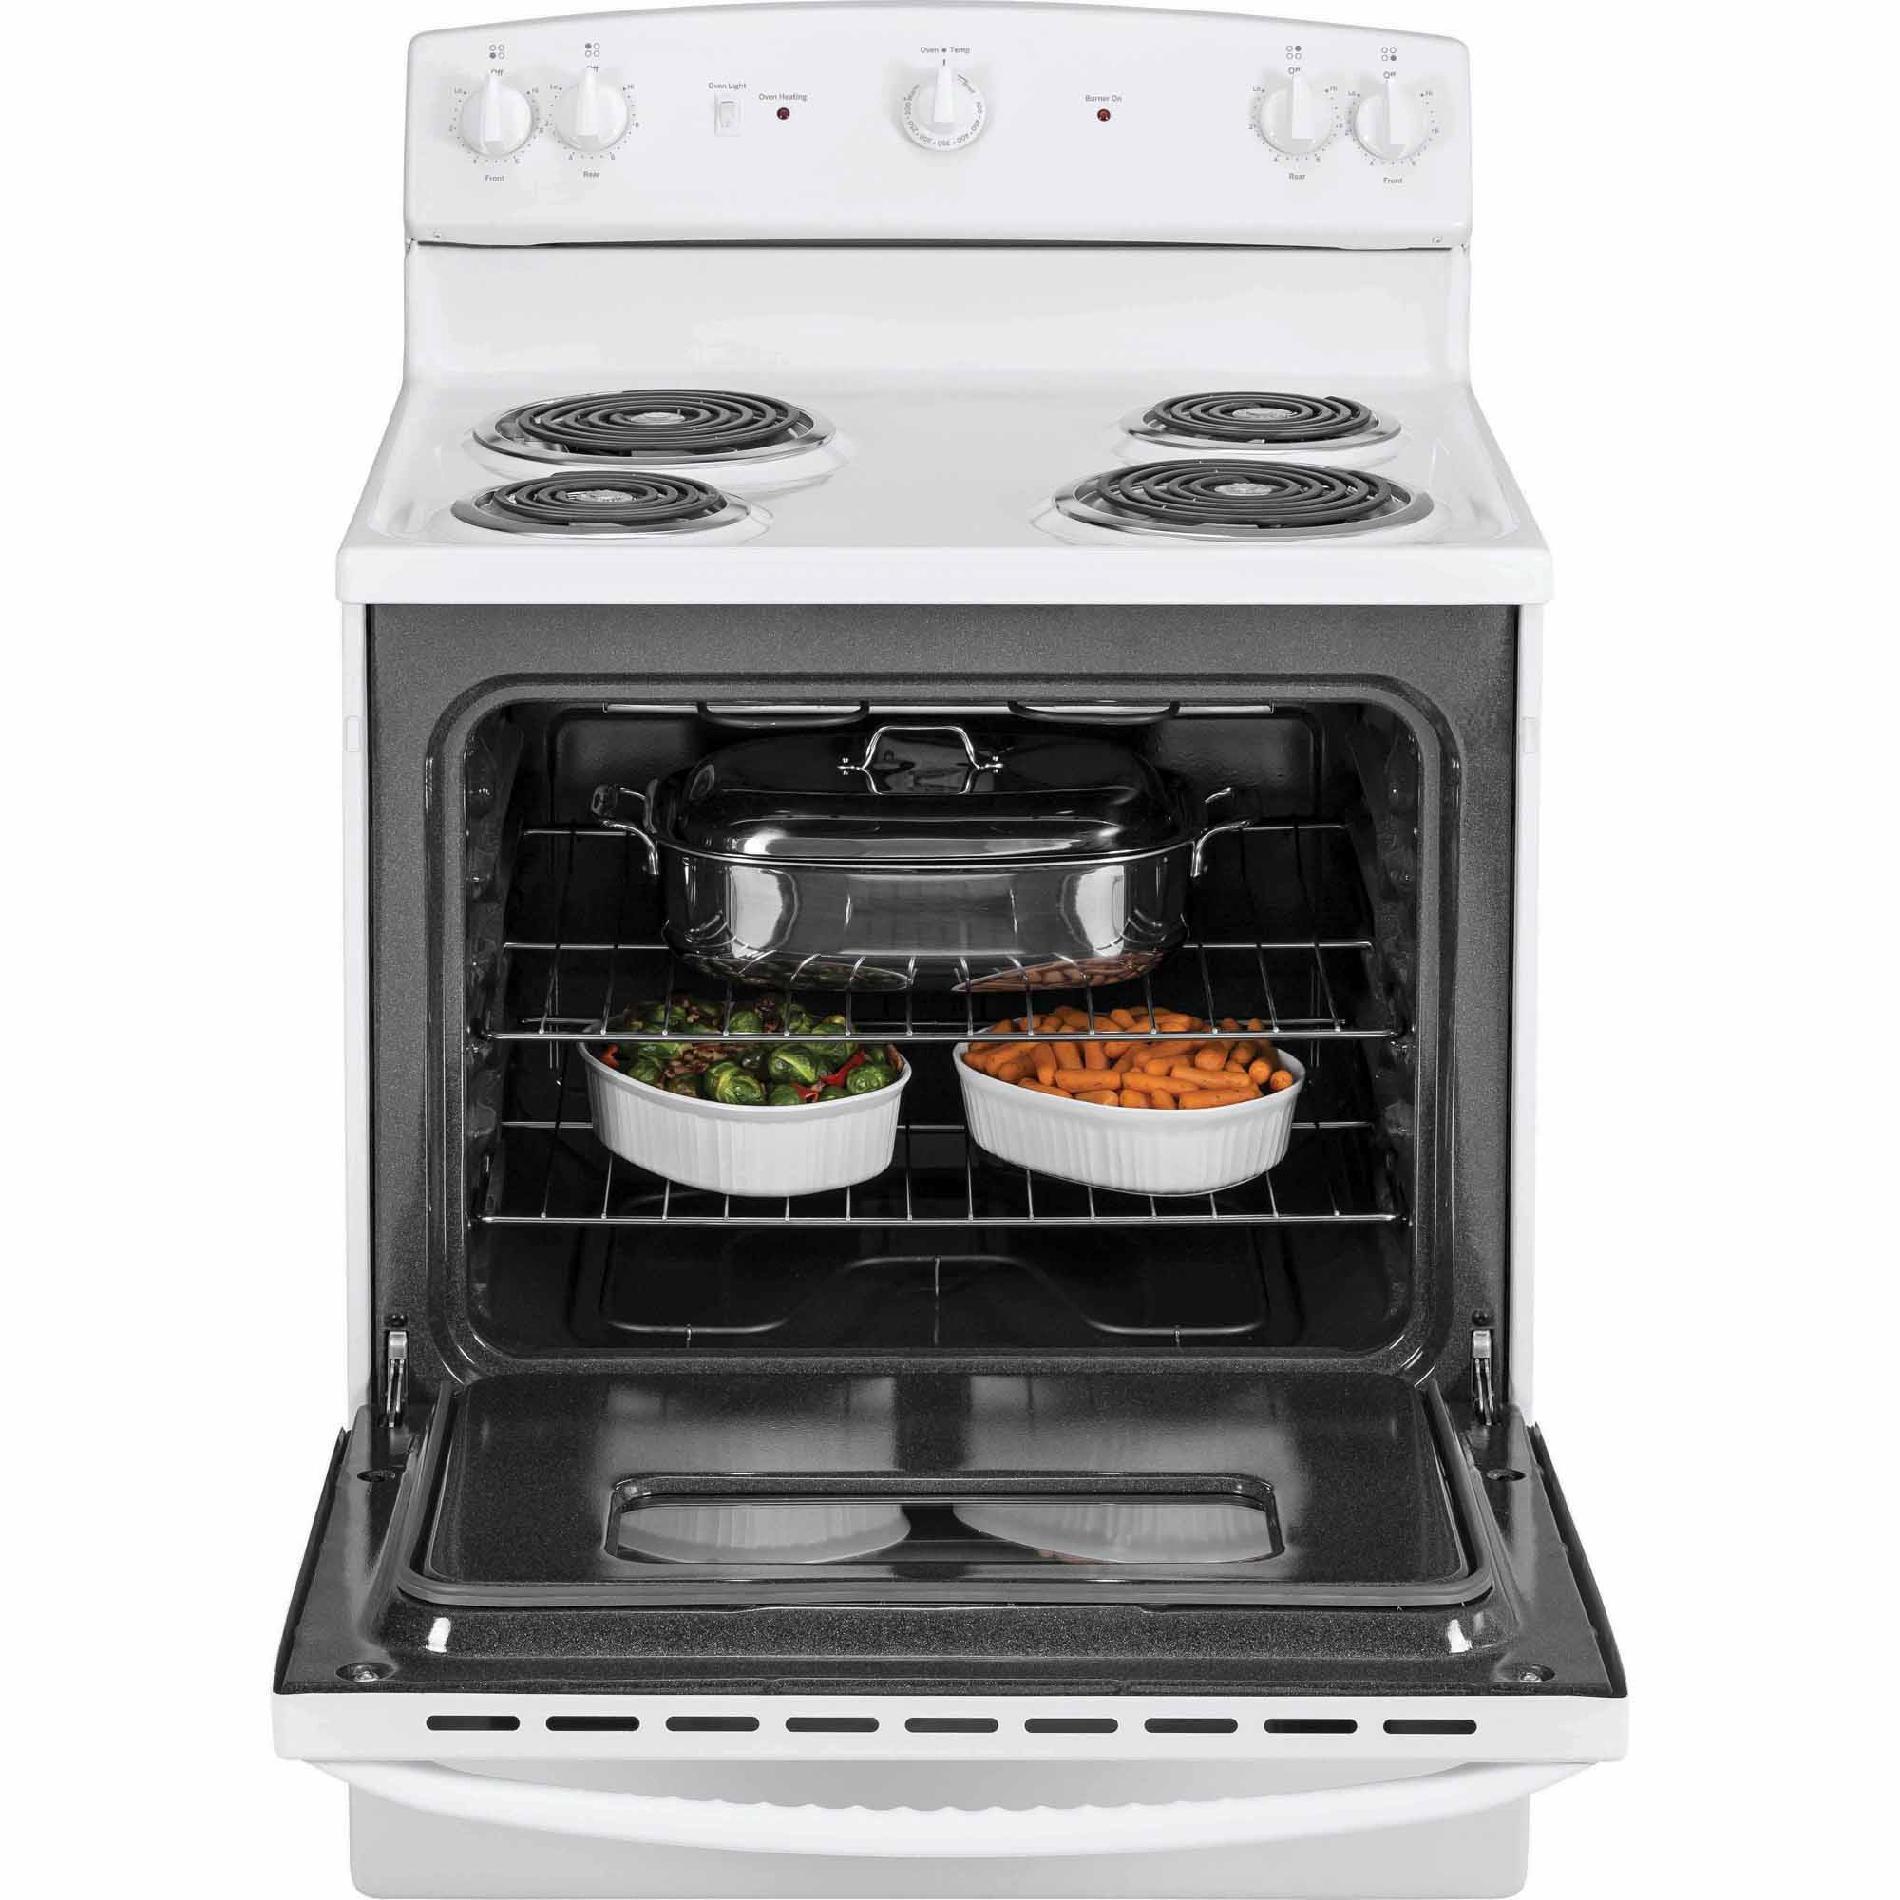 GE Appliances JBS10DFWW 5.0 cu. ft. Electric Range - White